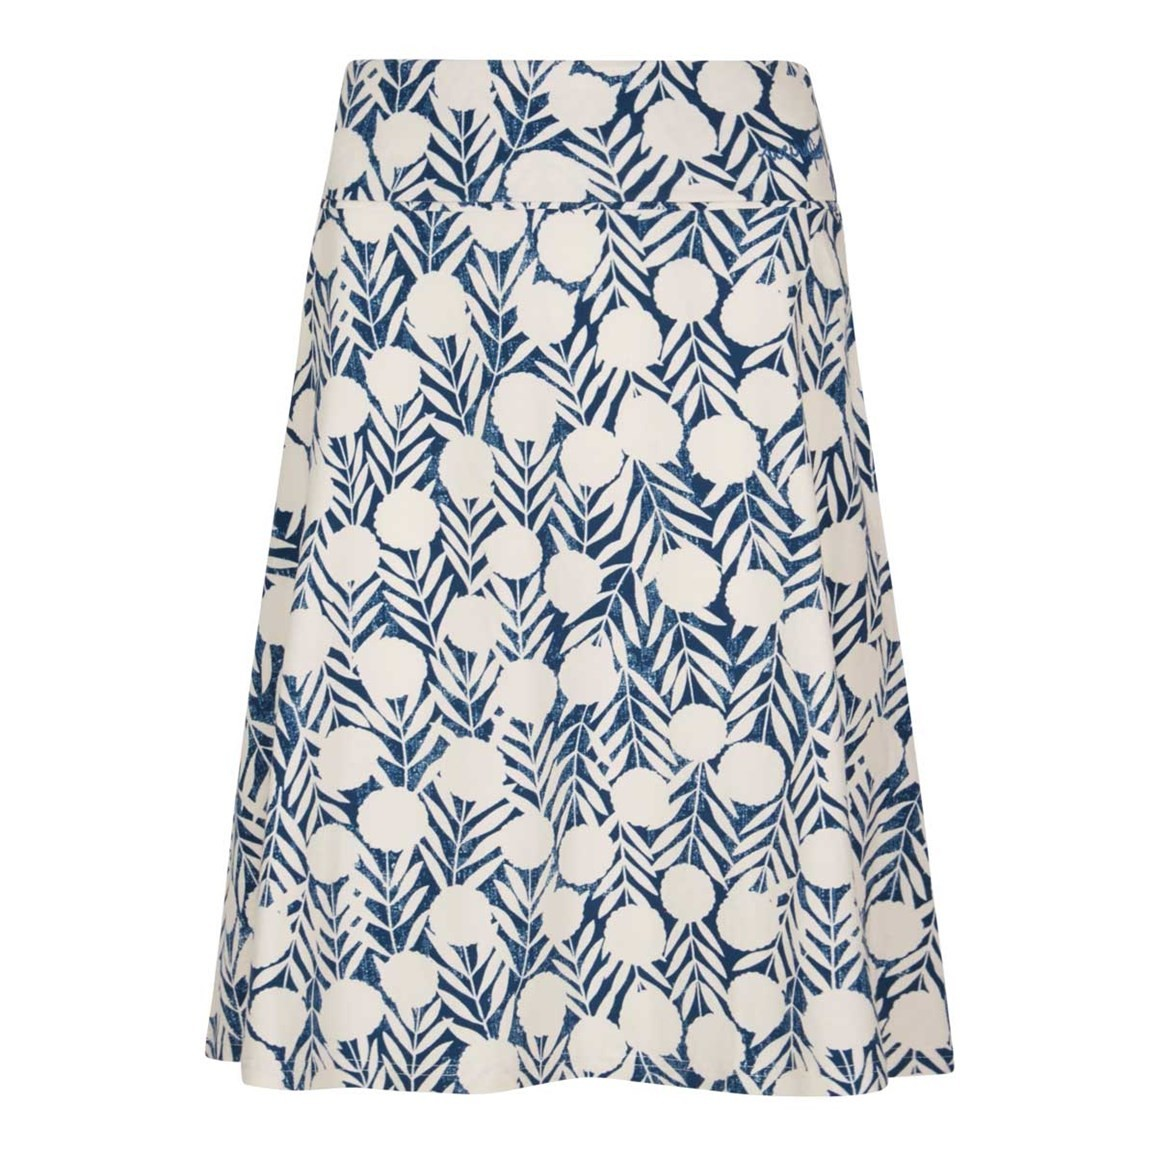 Weird Fish Malmo Printed Jersey Skirt Dark Denim Size 10